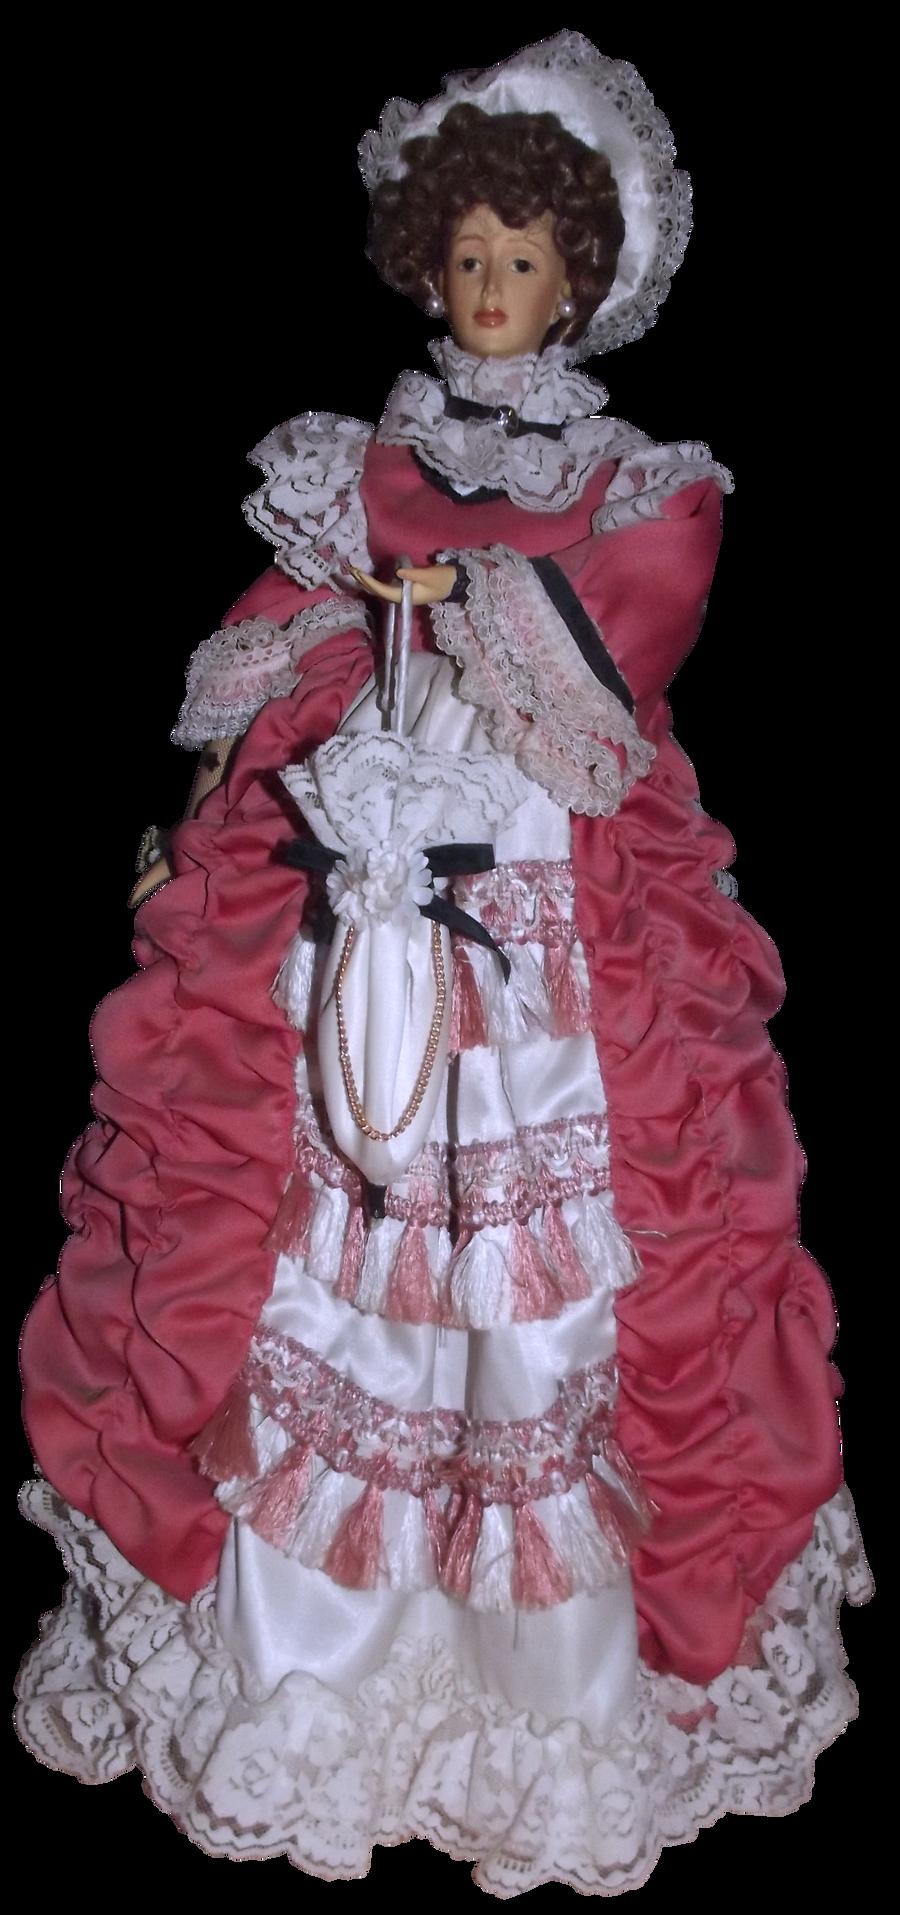 Antique Doll 002 - Clear Cut [UPDATE] by Travail-de-lame